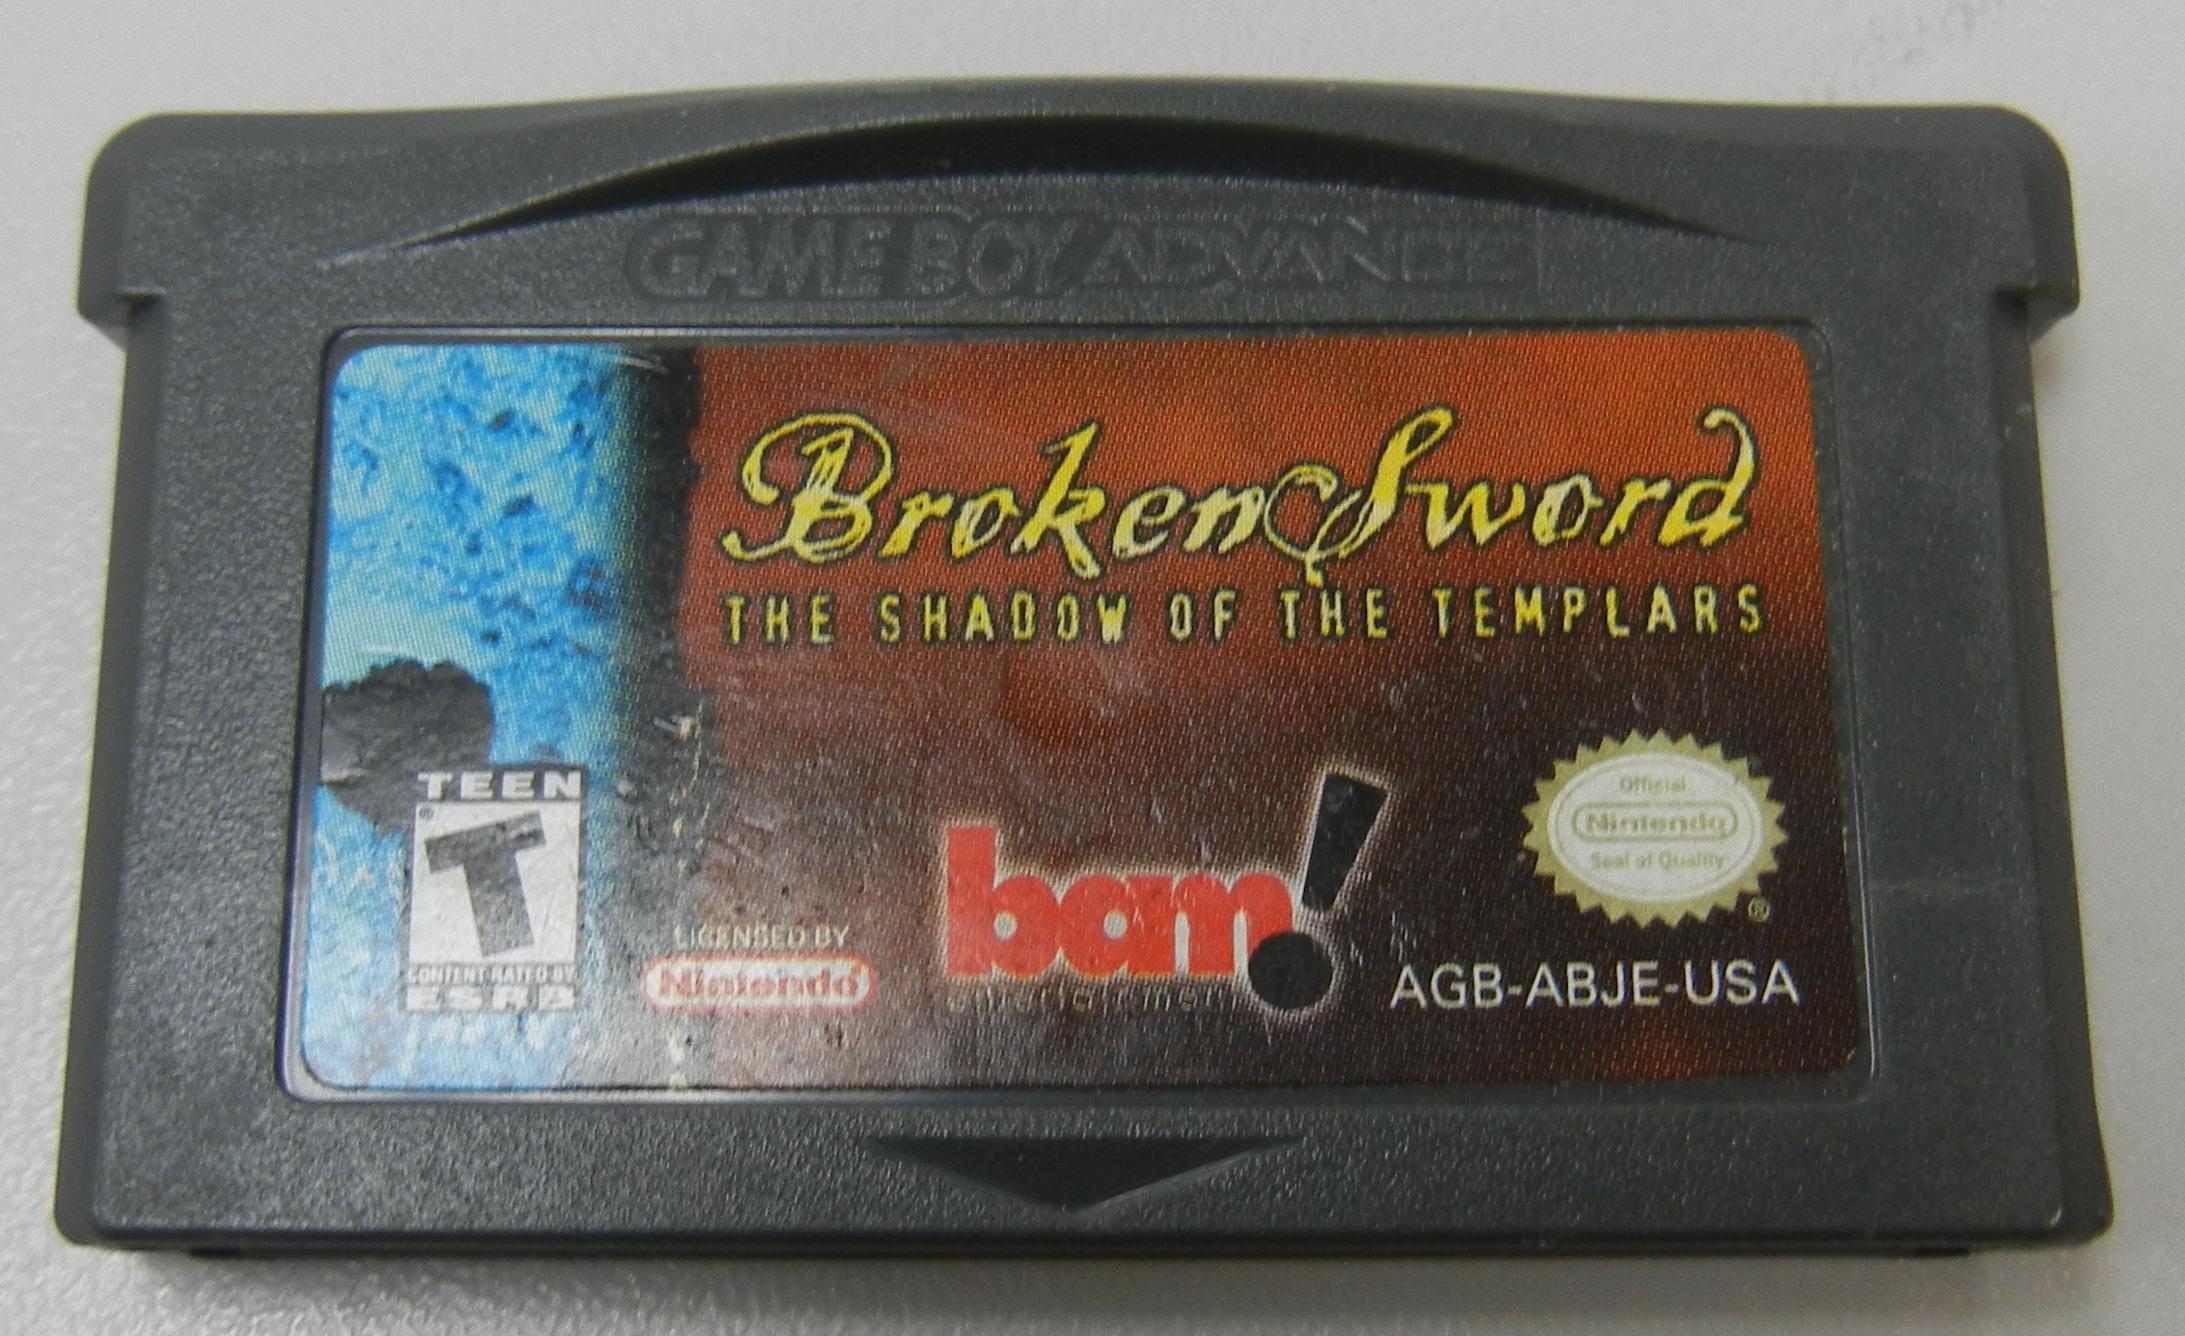 BROKEN SWORD THE SHADOW OF THE TEMPLARS - GAMEBOY ADVANCE GAME